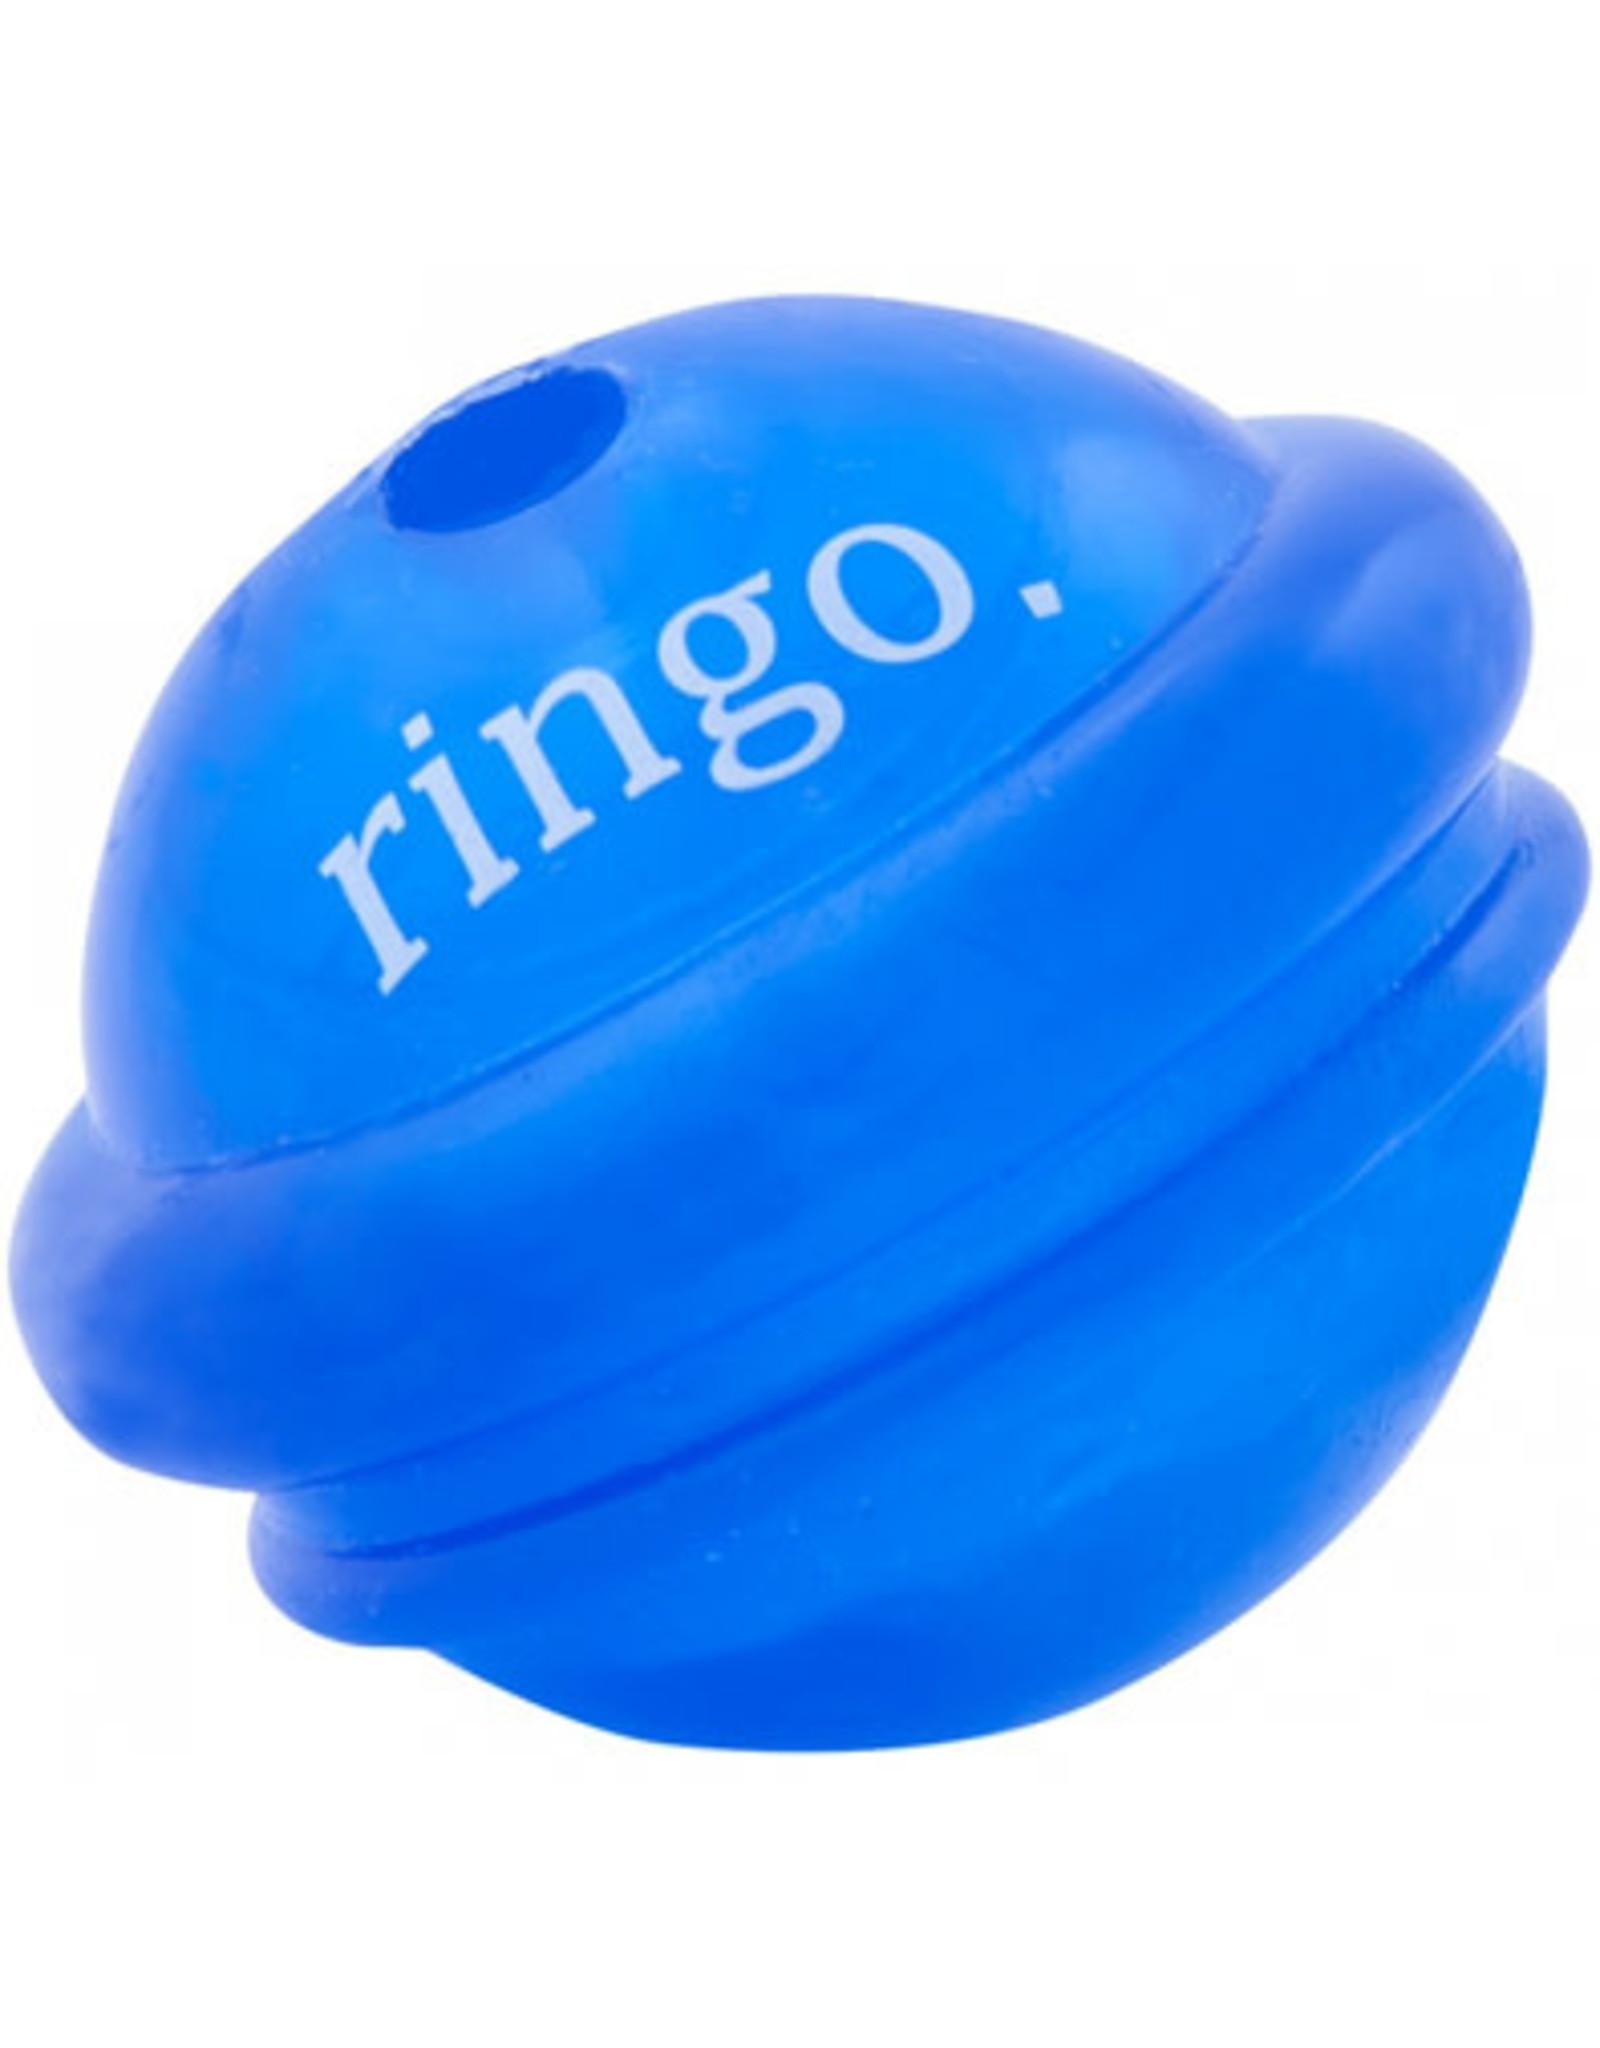 Planet Dog Orbee-Tuff Cosmos Ball - Ringo